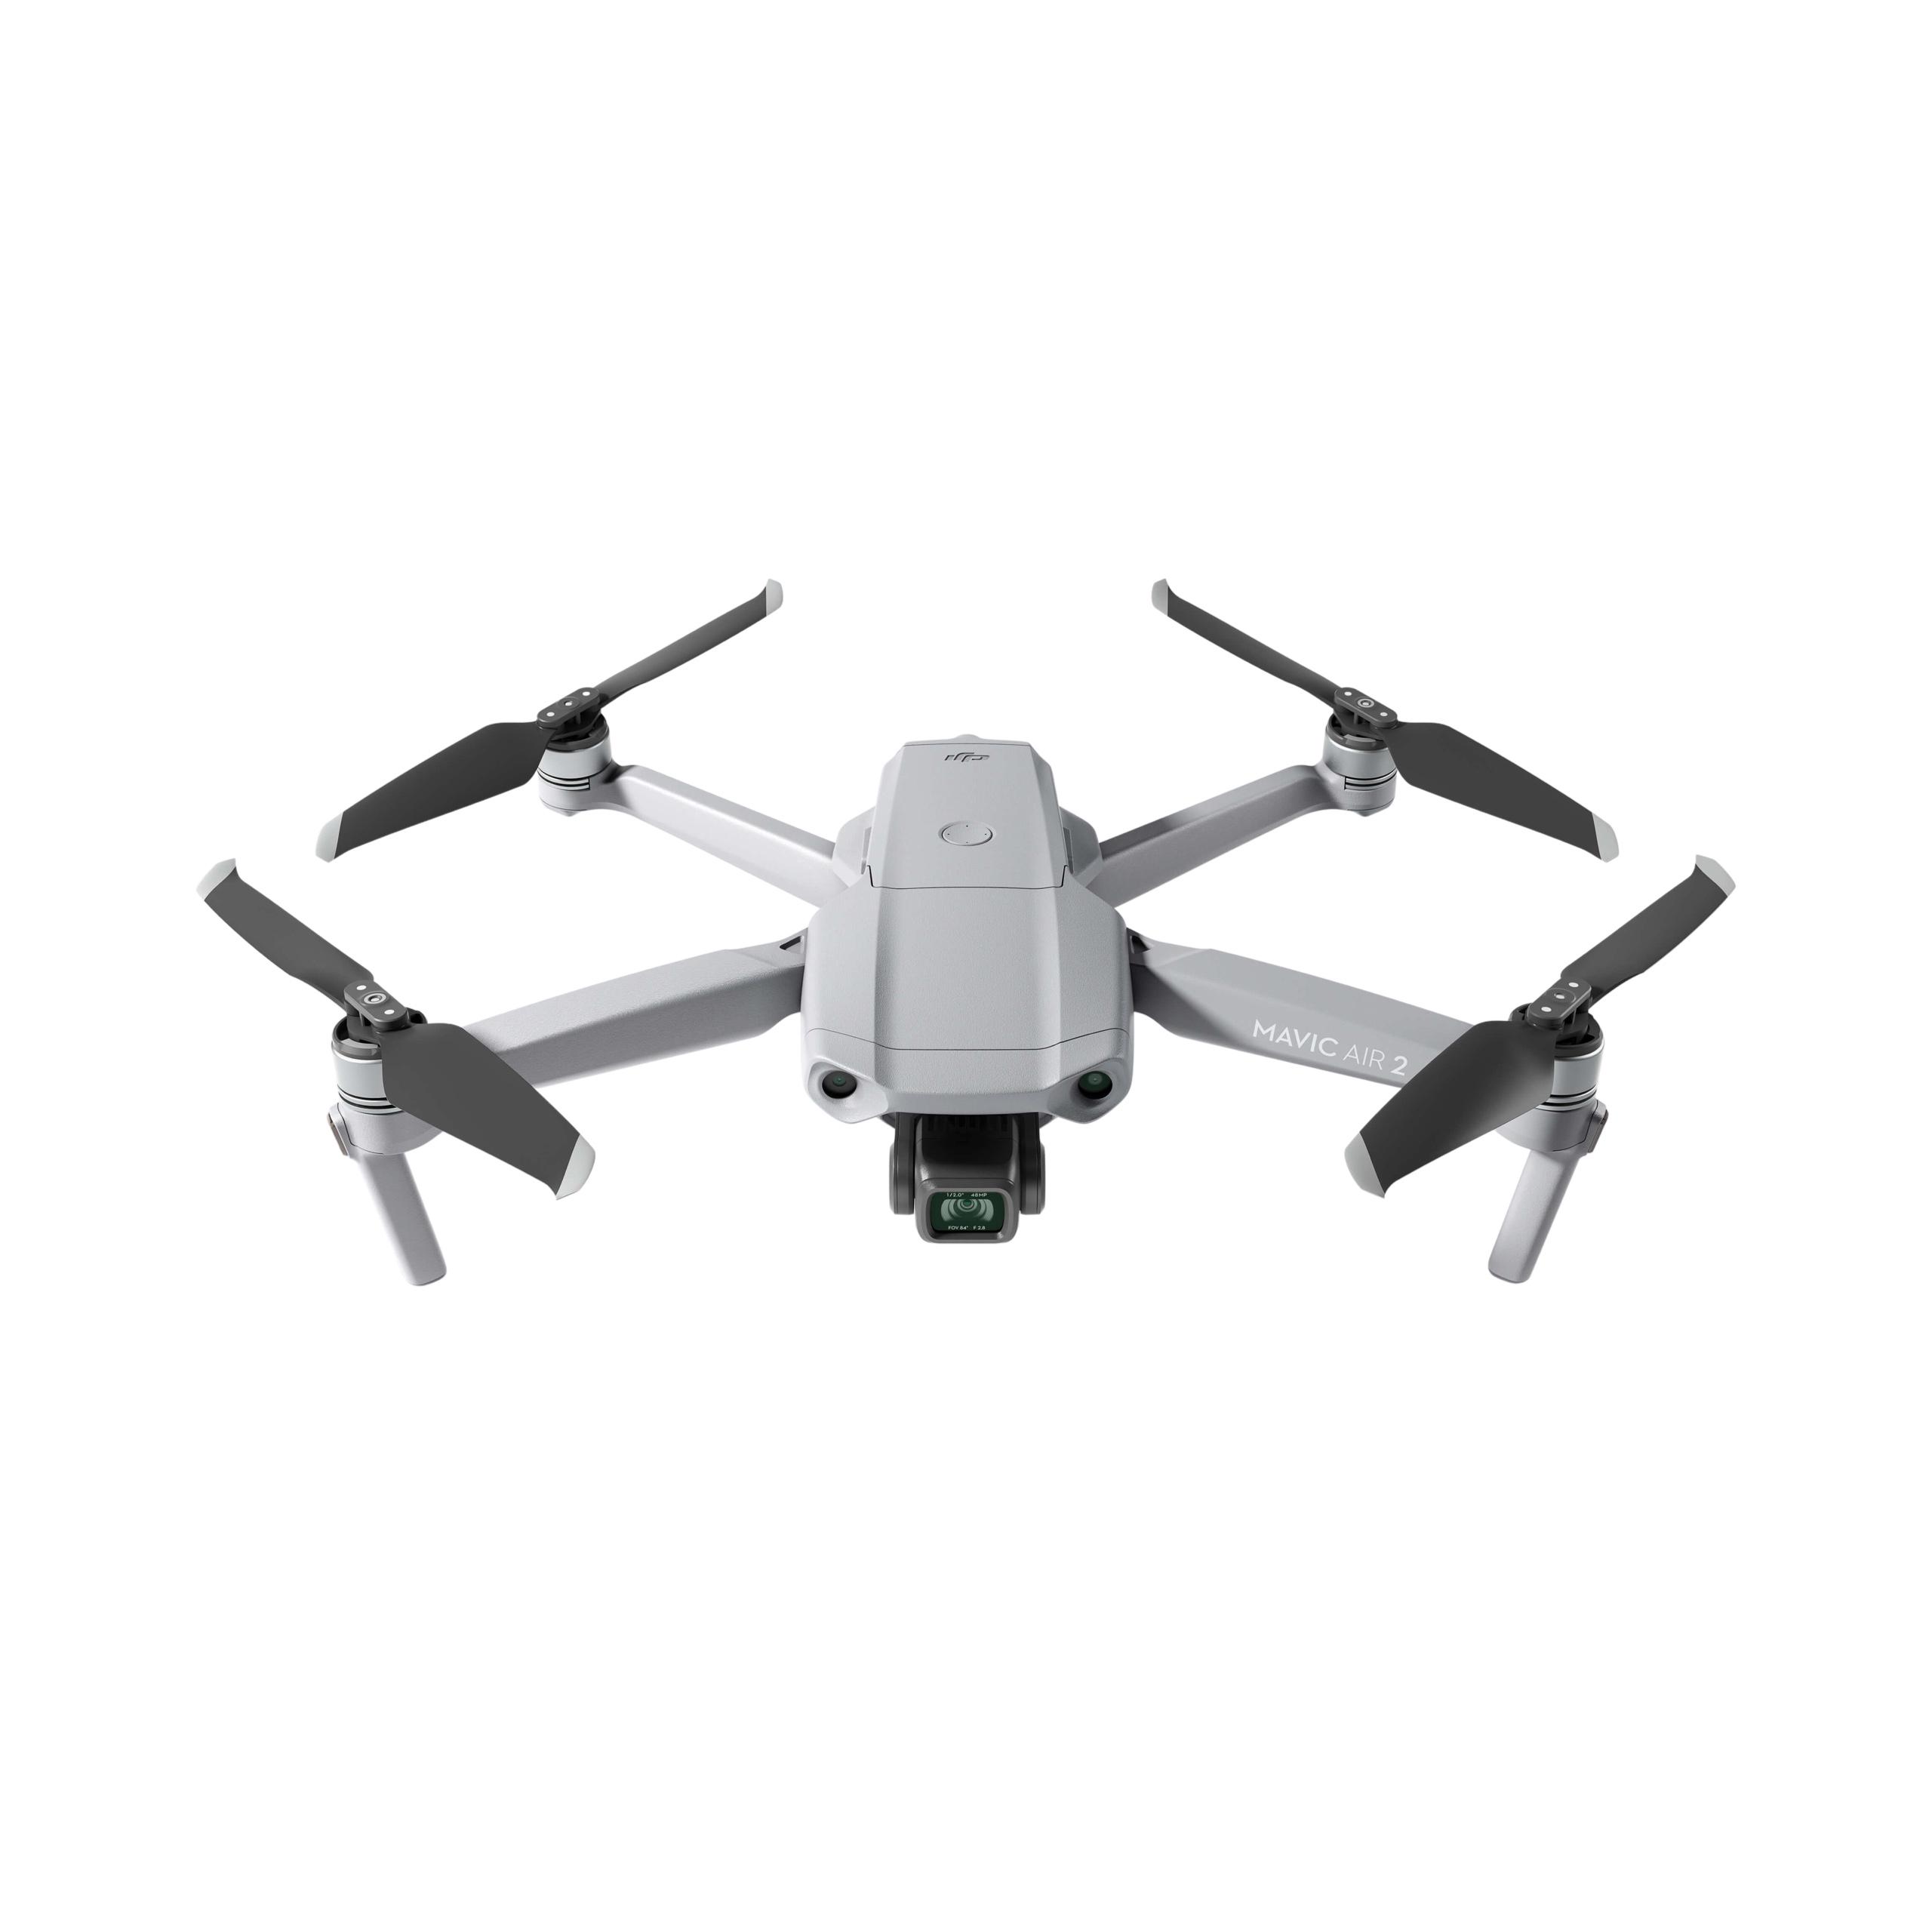 DJI Mavic Air 2 Drone Camera review